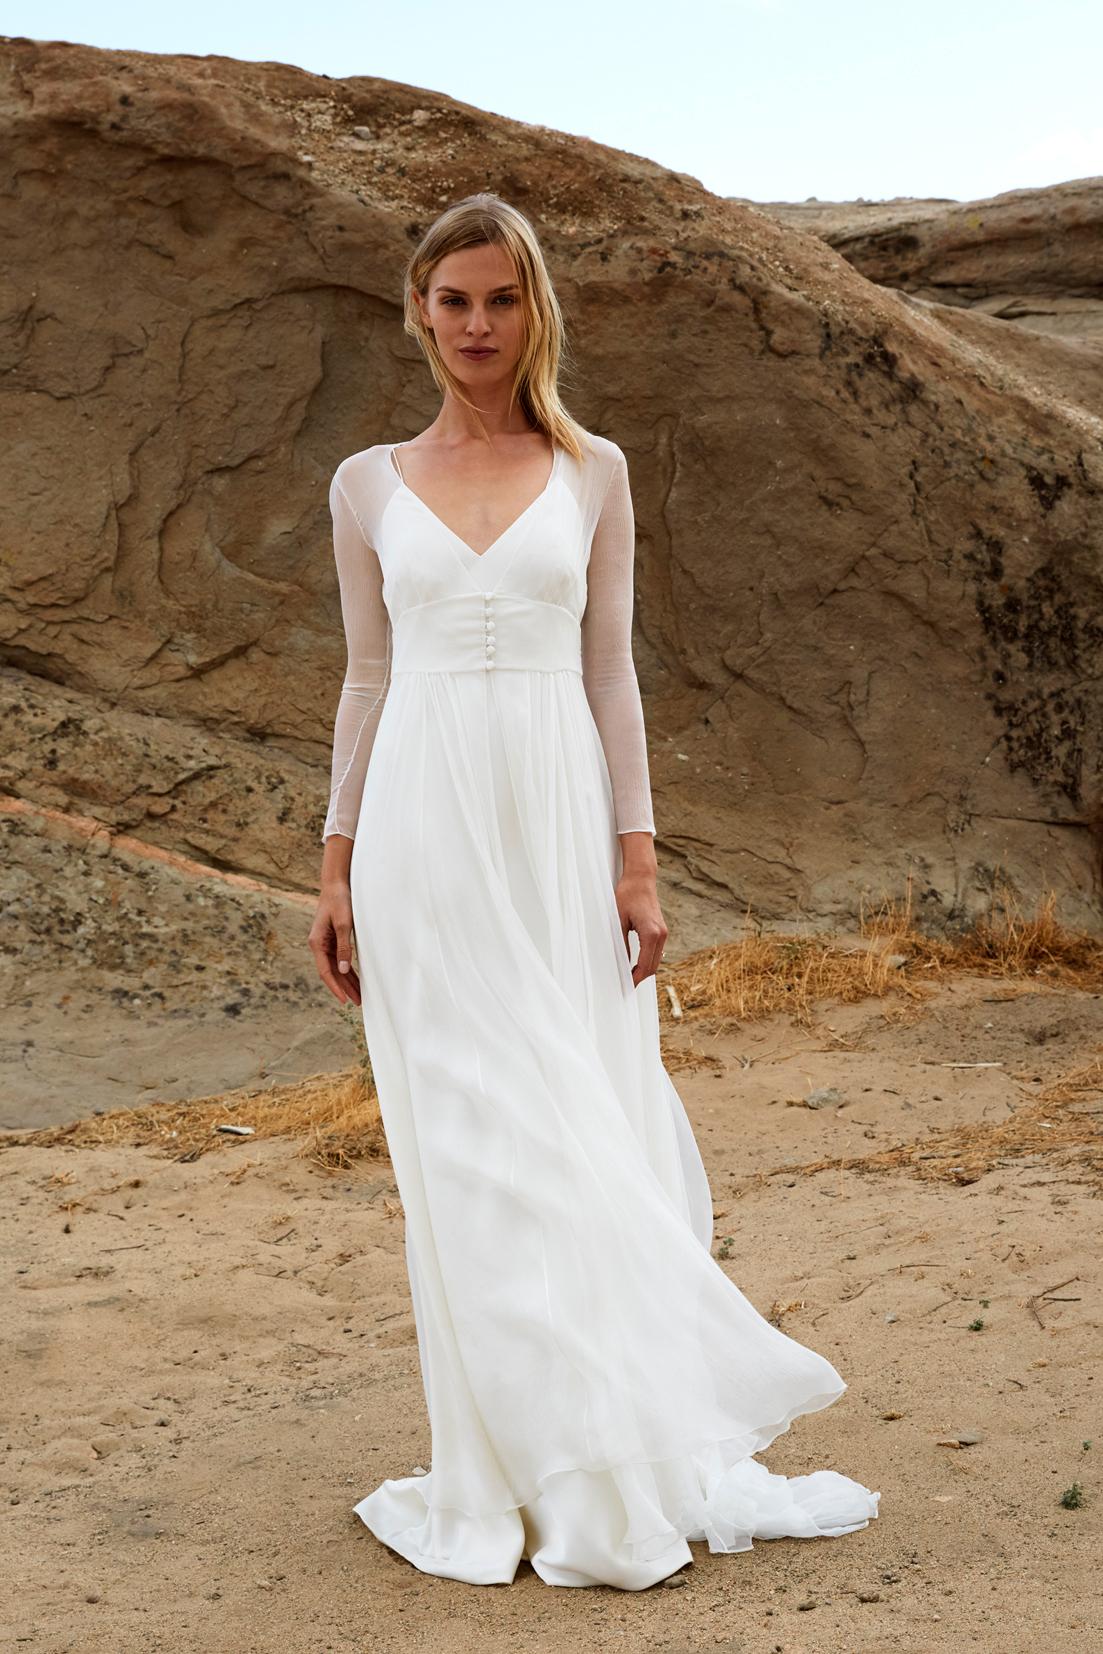 savannah miller fall 2018 spaghetti strap chiffon overlay wedding dress